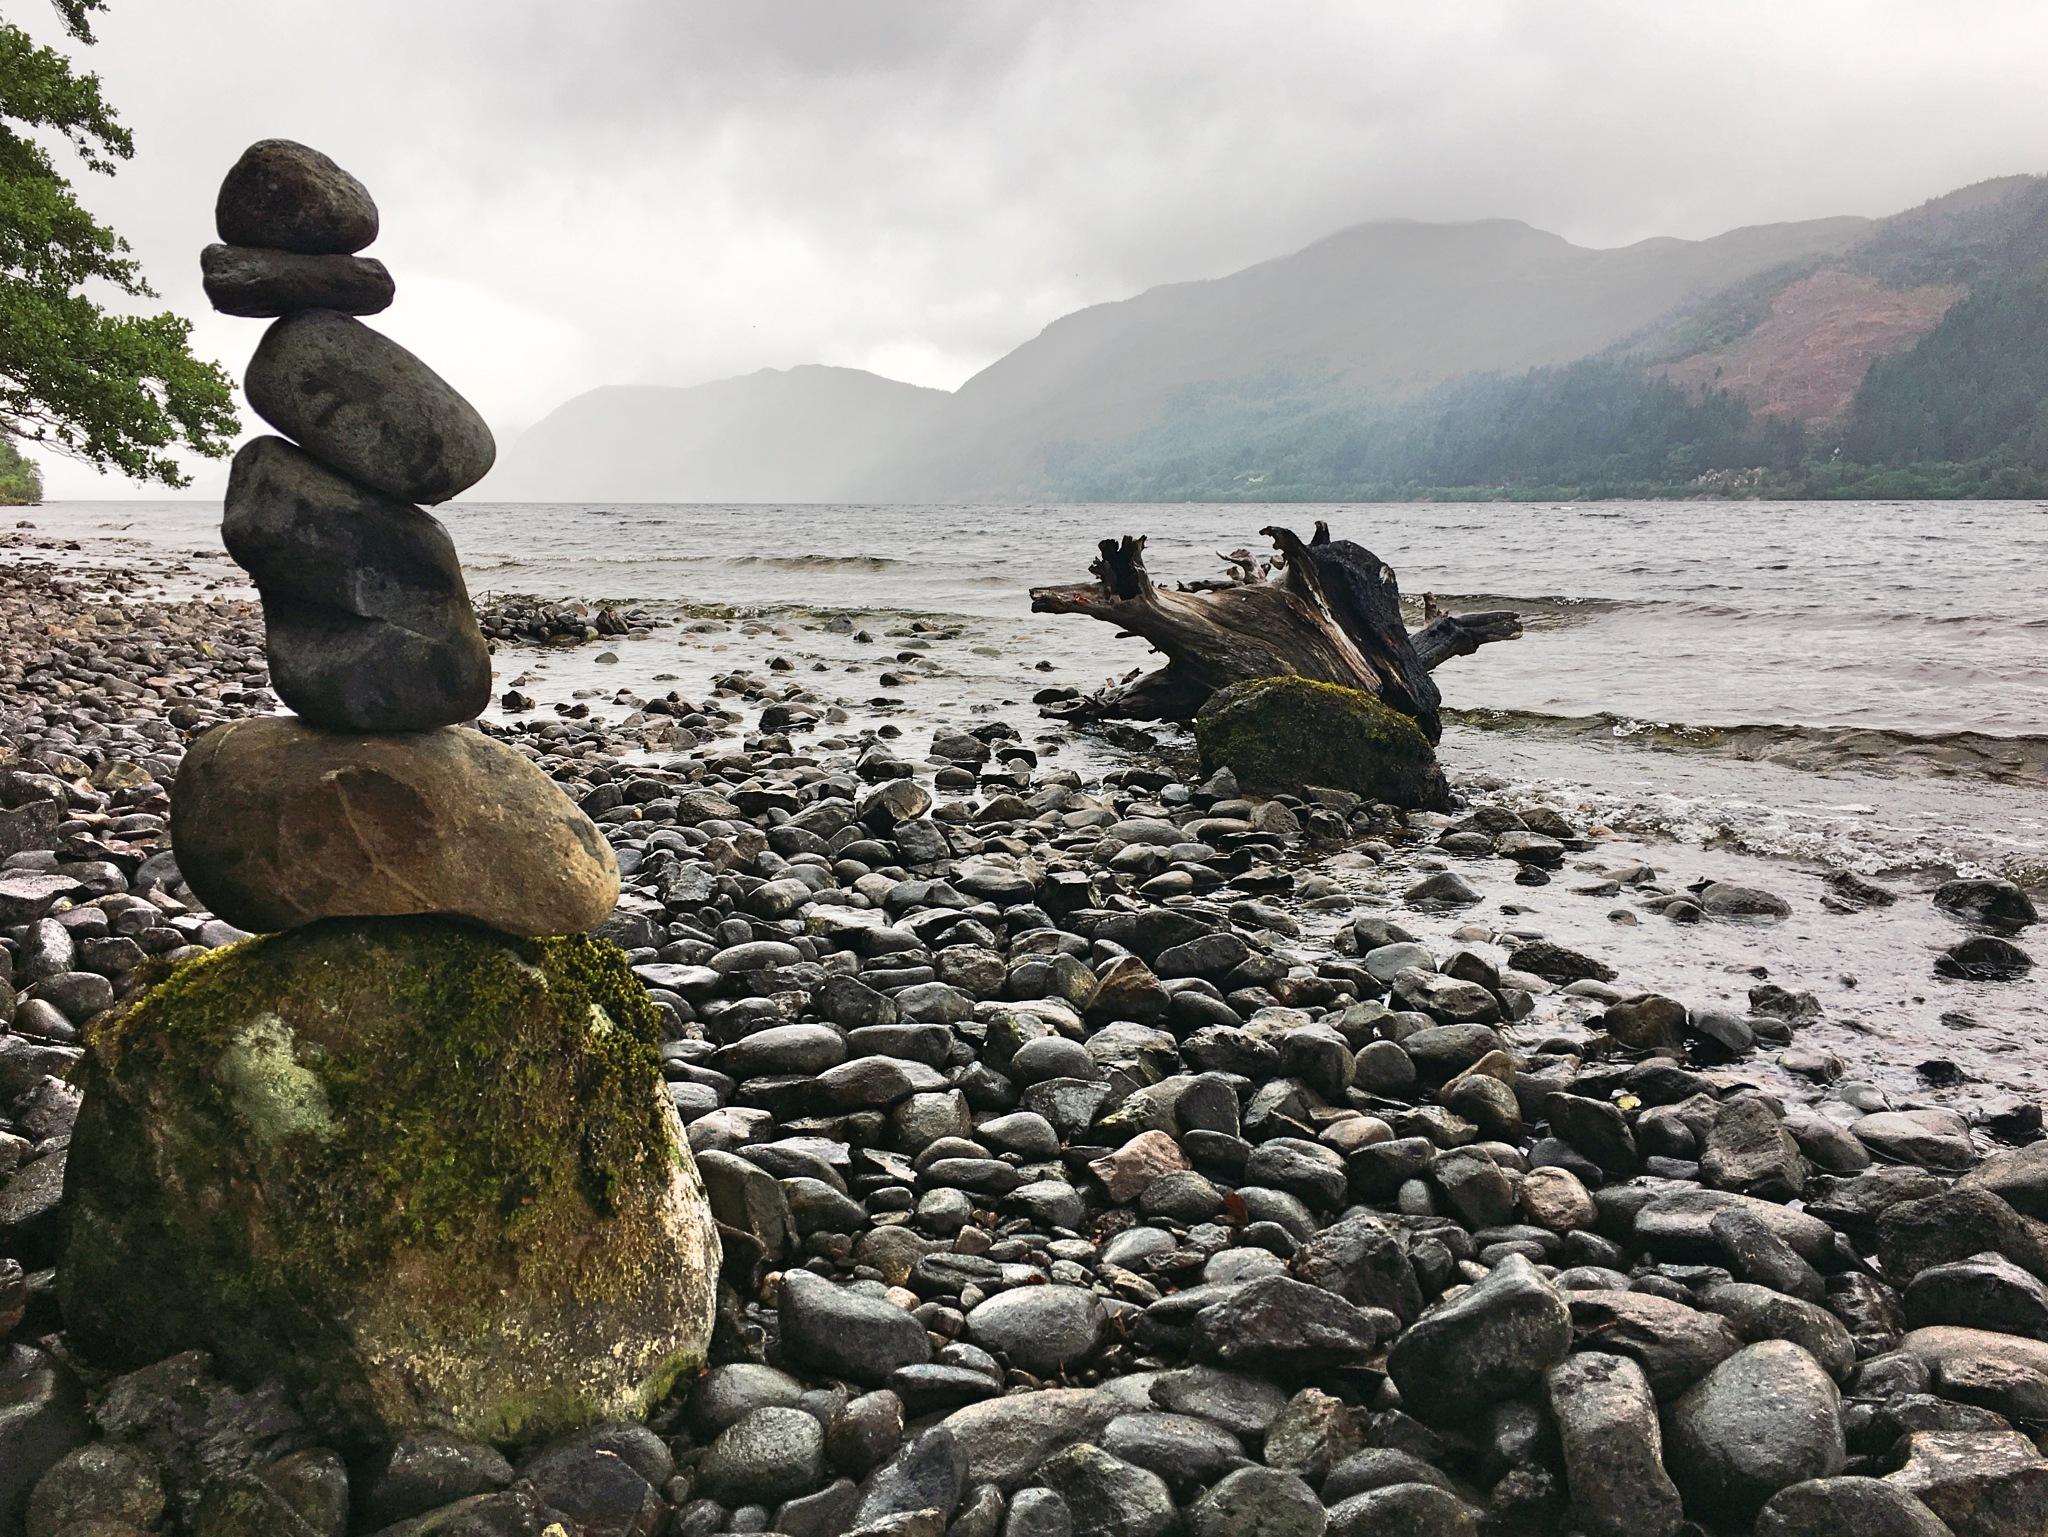 Balanced stones at Loch Ness by Paul Stobbs